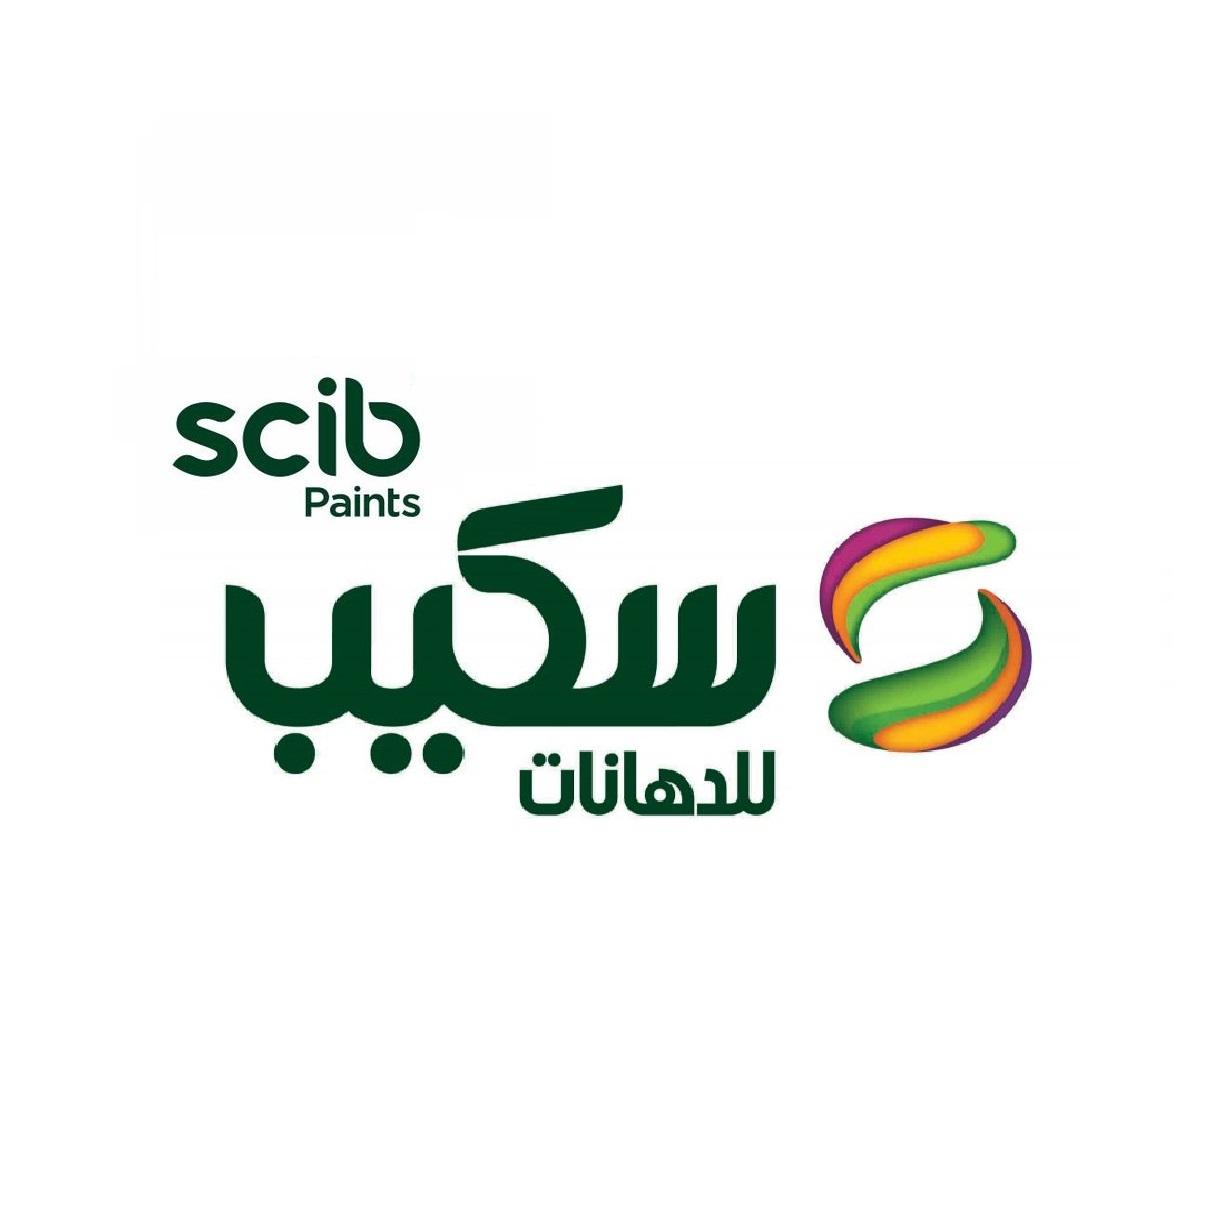 Scib Paints Company